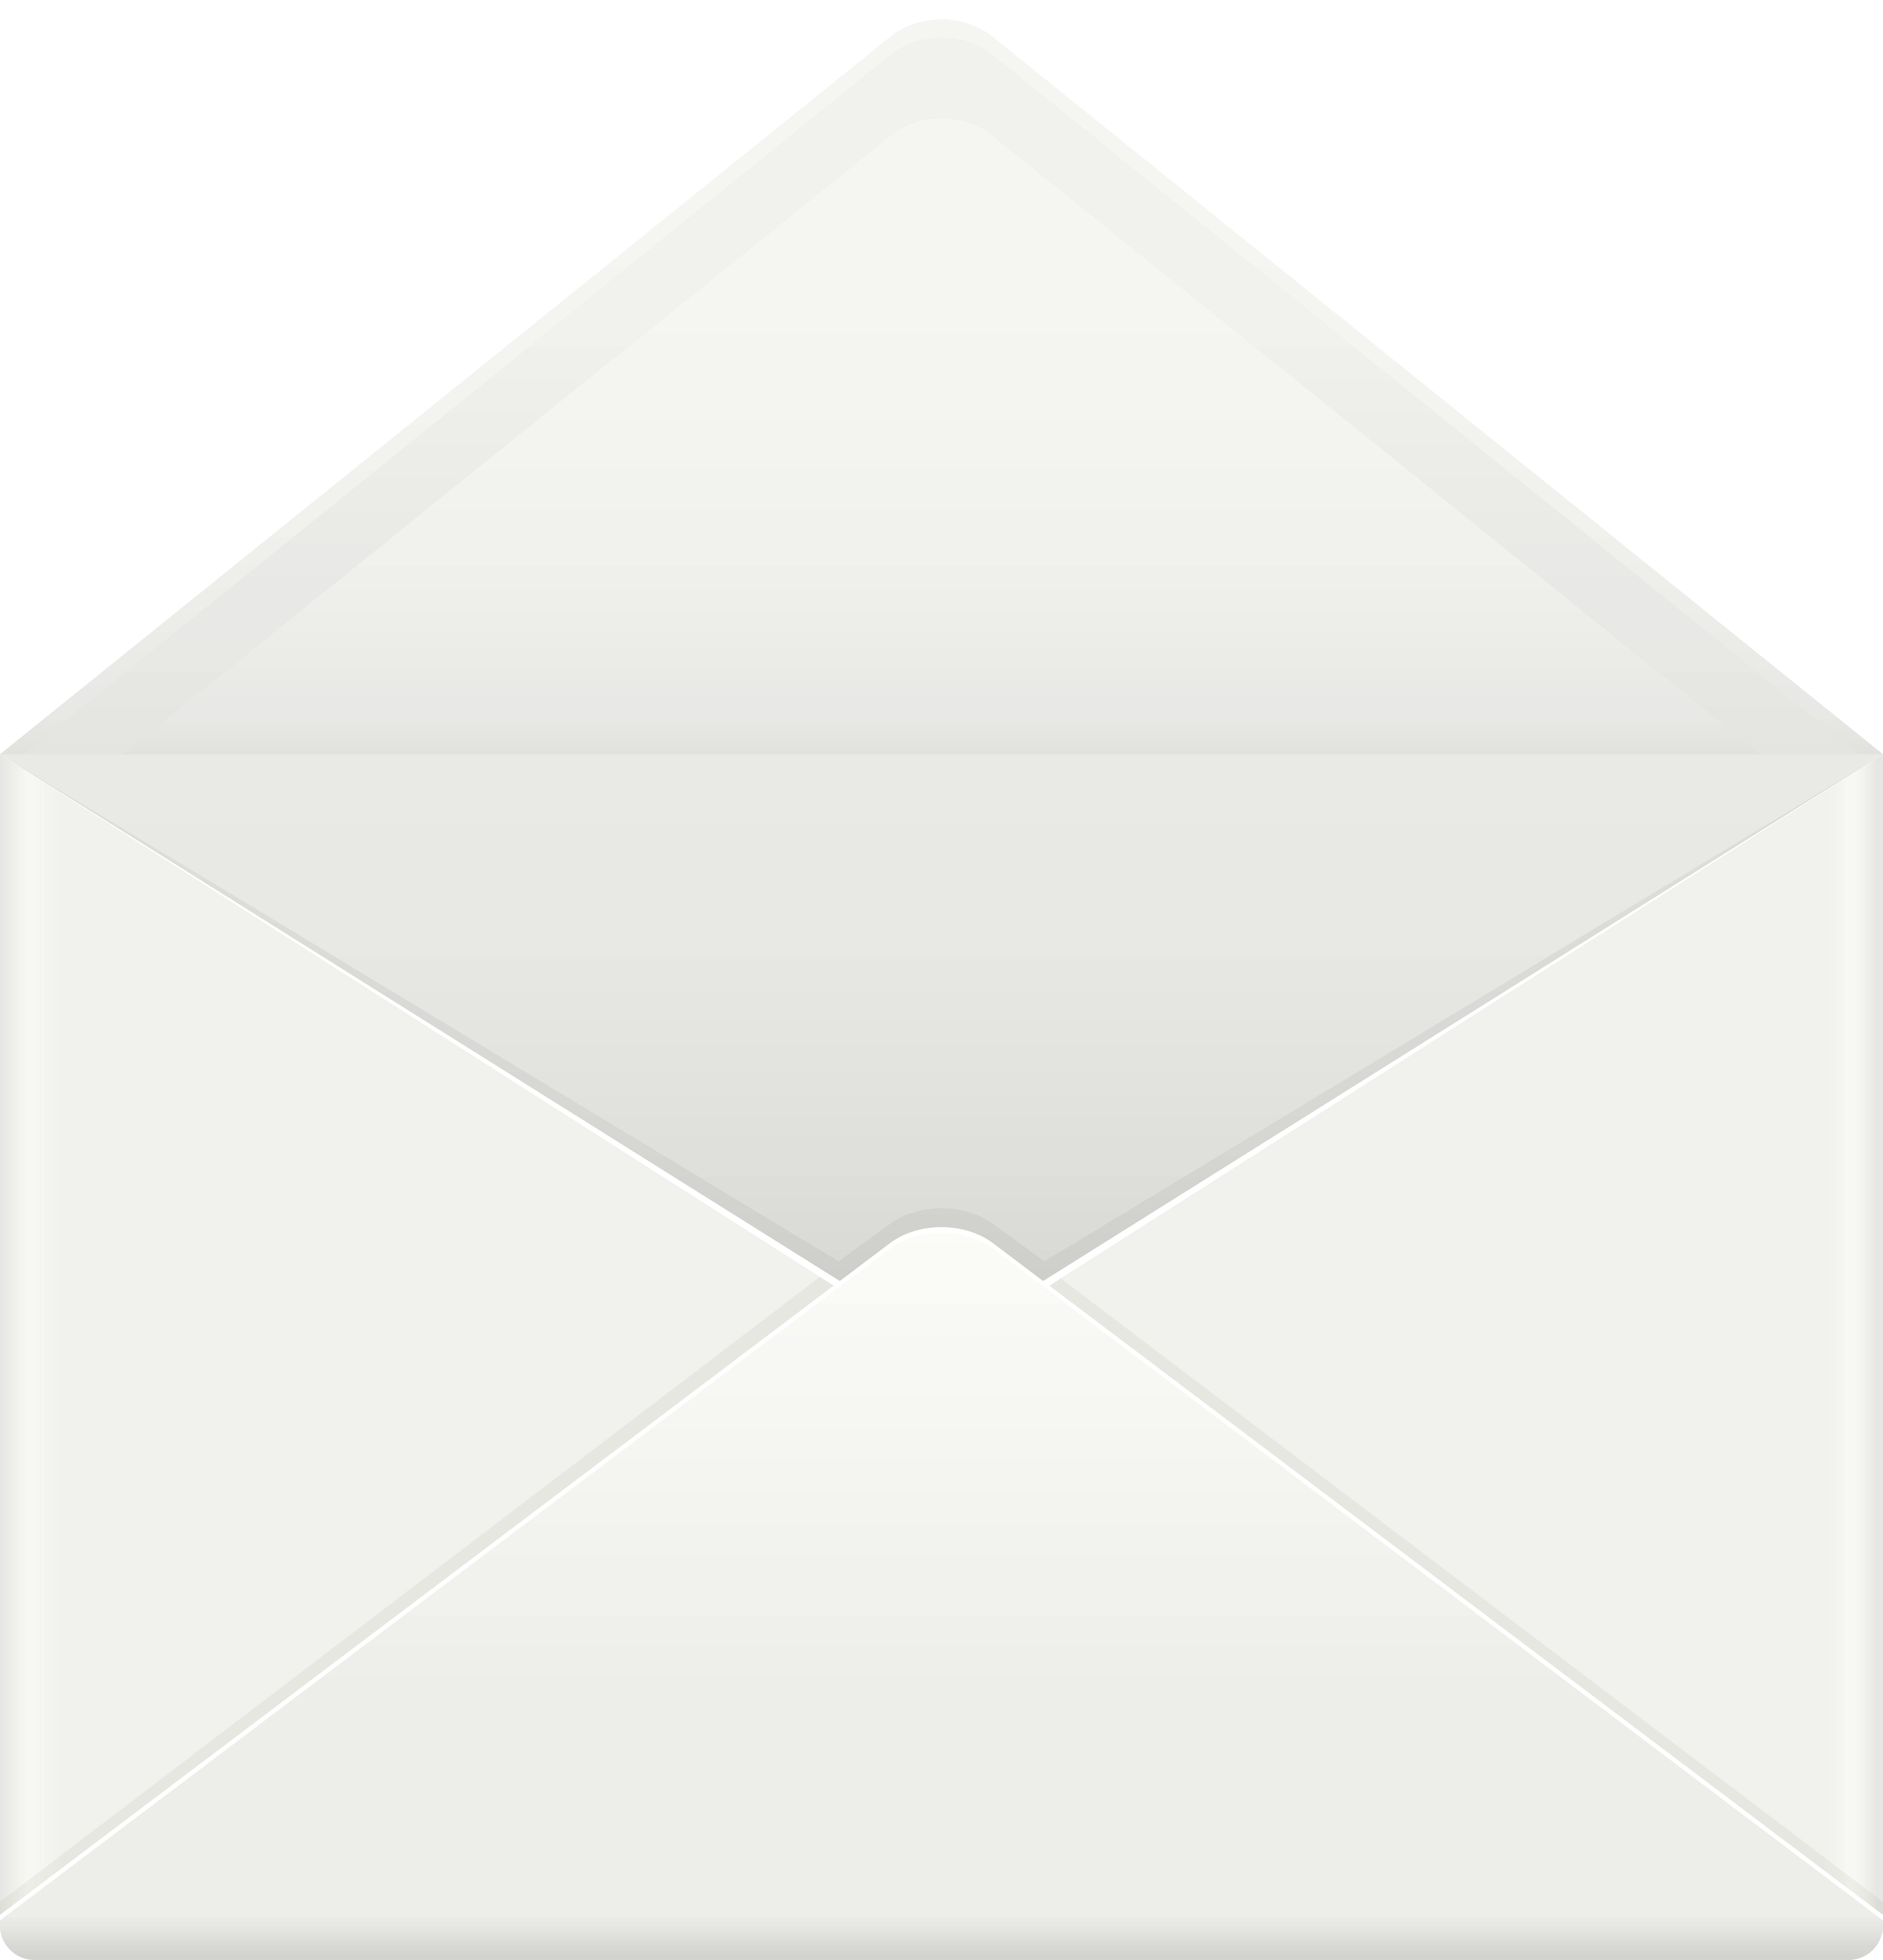 Open Envelope PNG Clip Art Image.